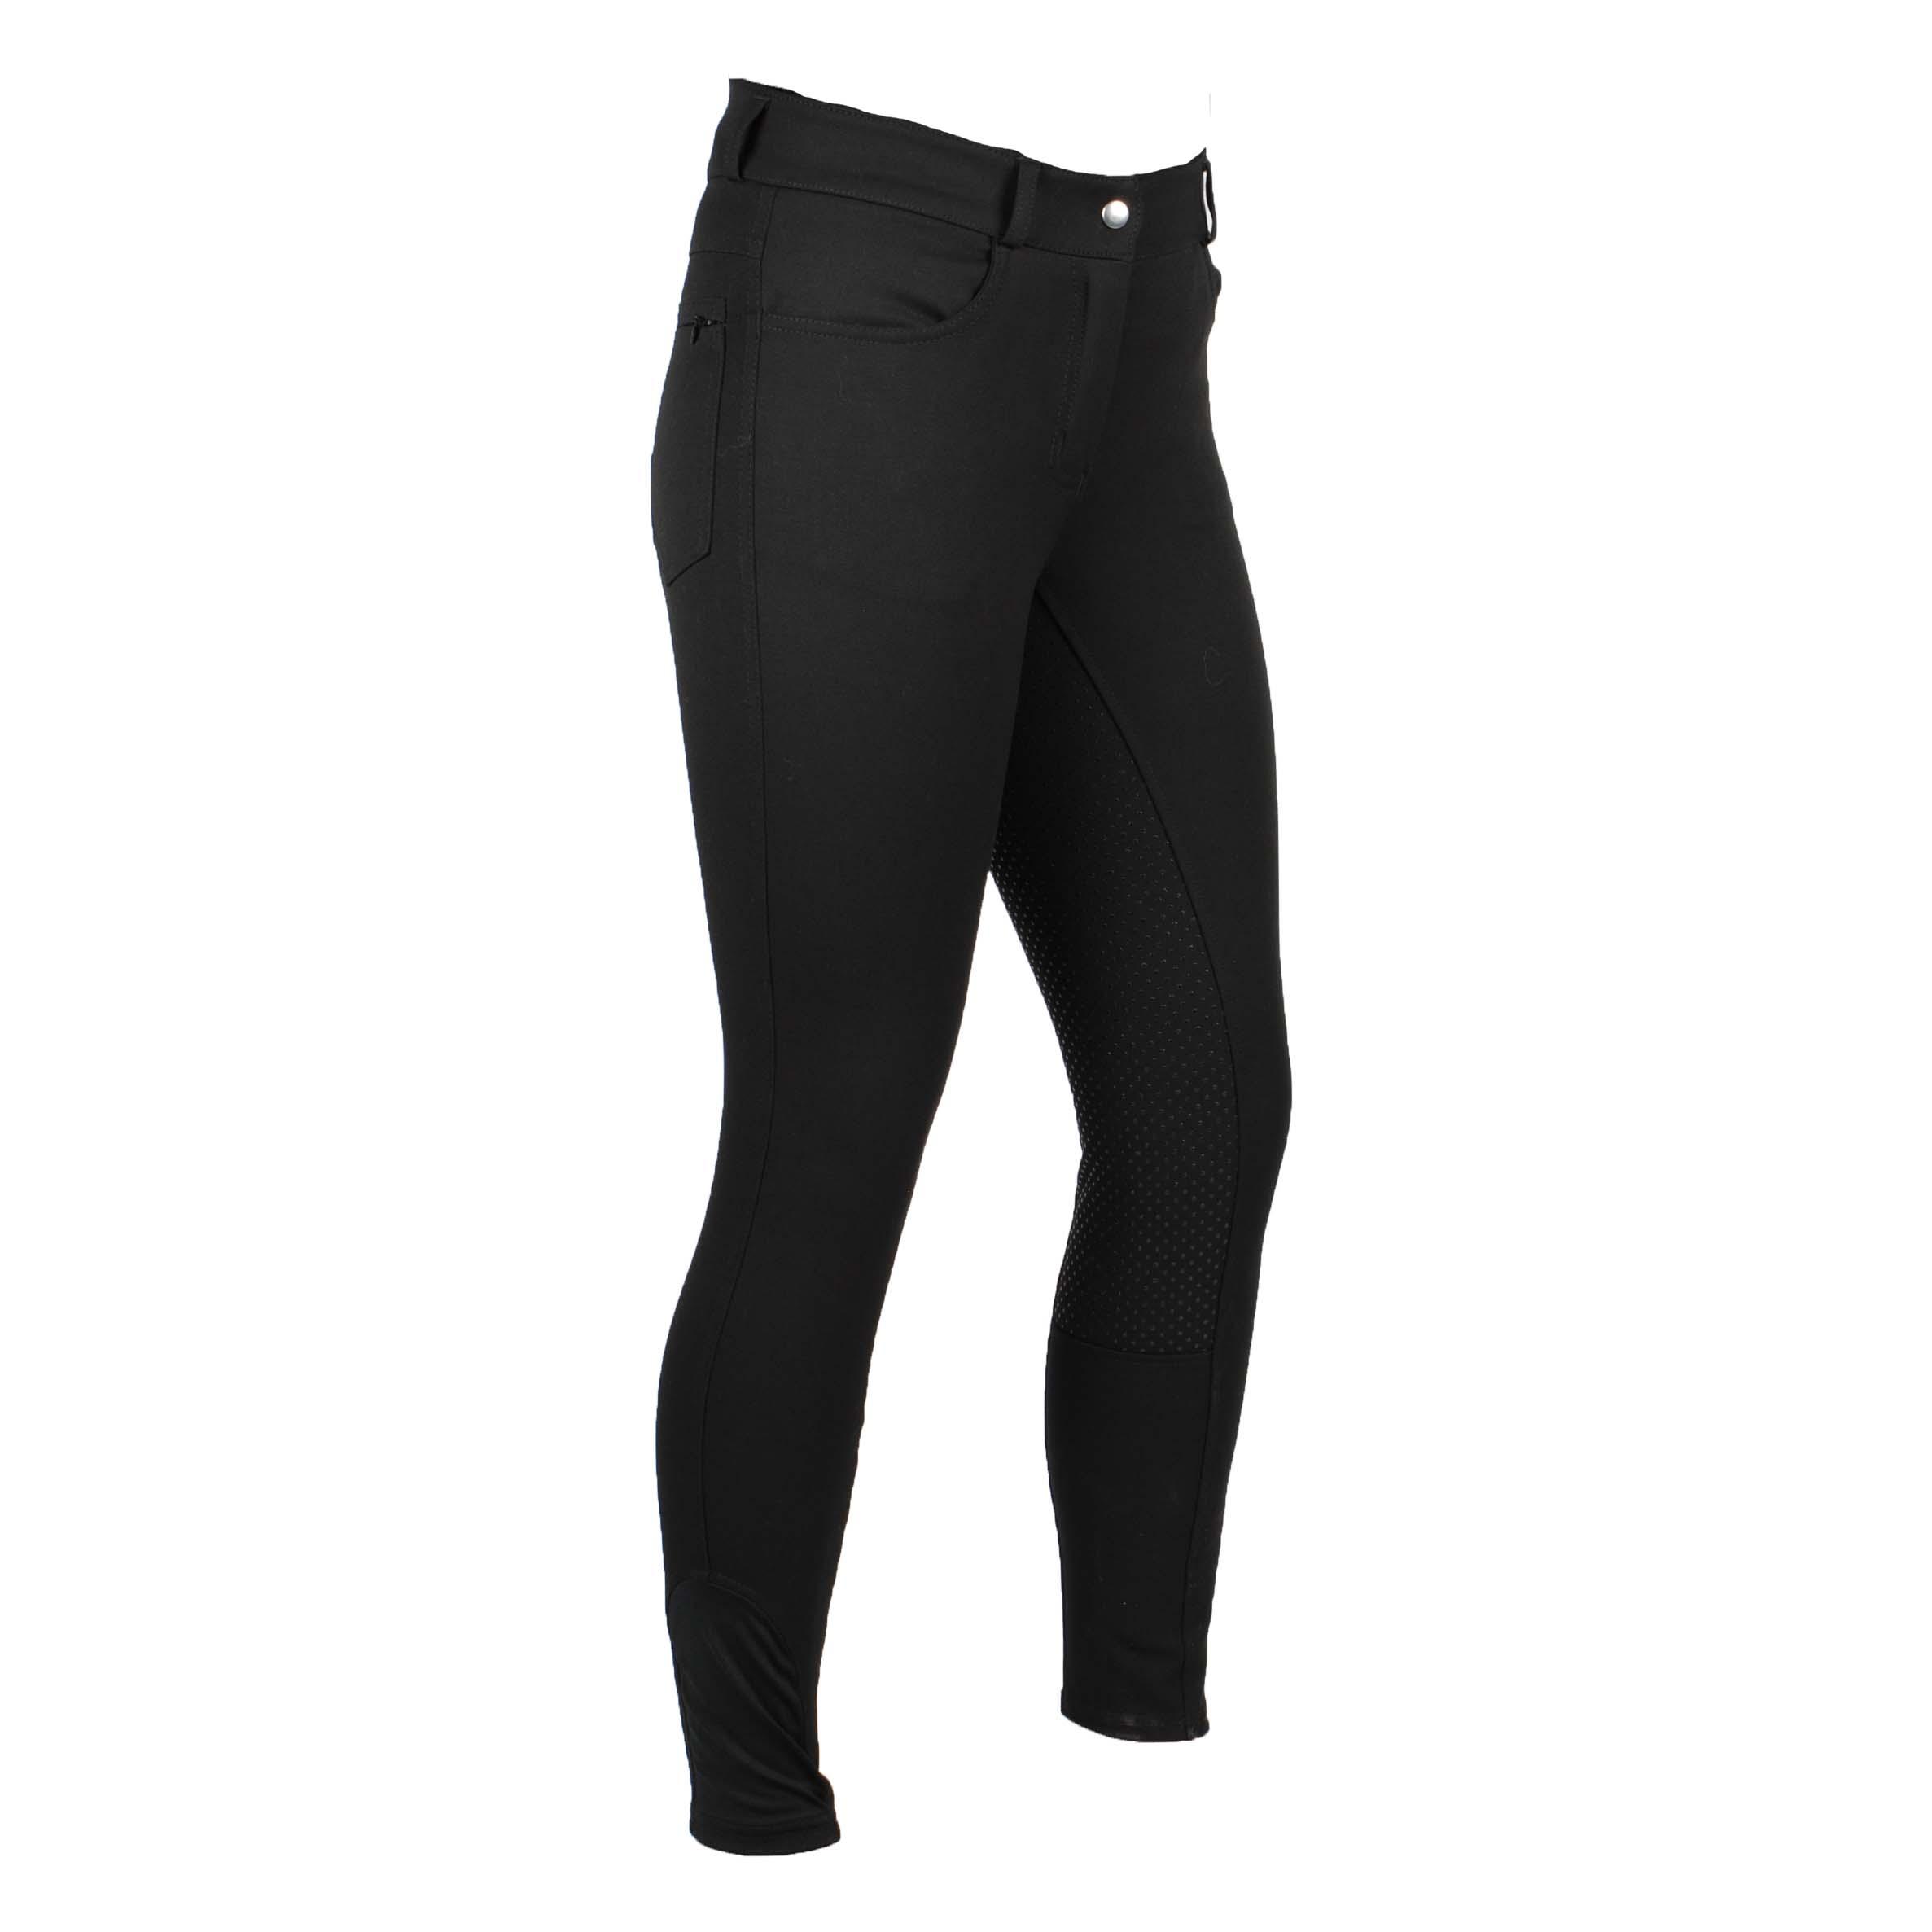 Mondoni Sada high waist full grip rijbroek zwart maat:44